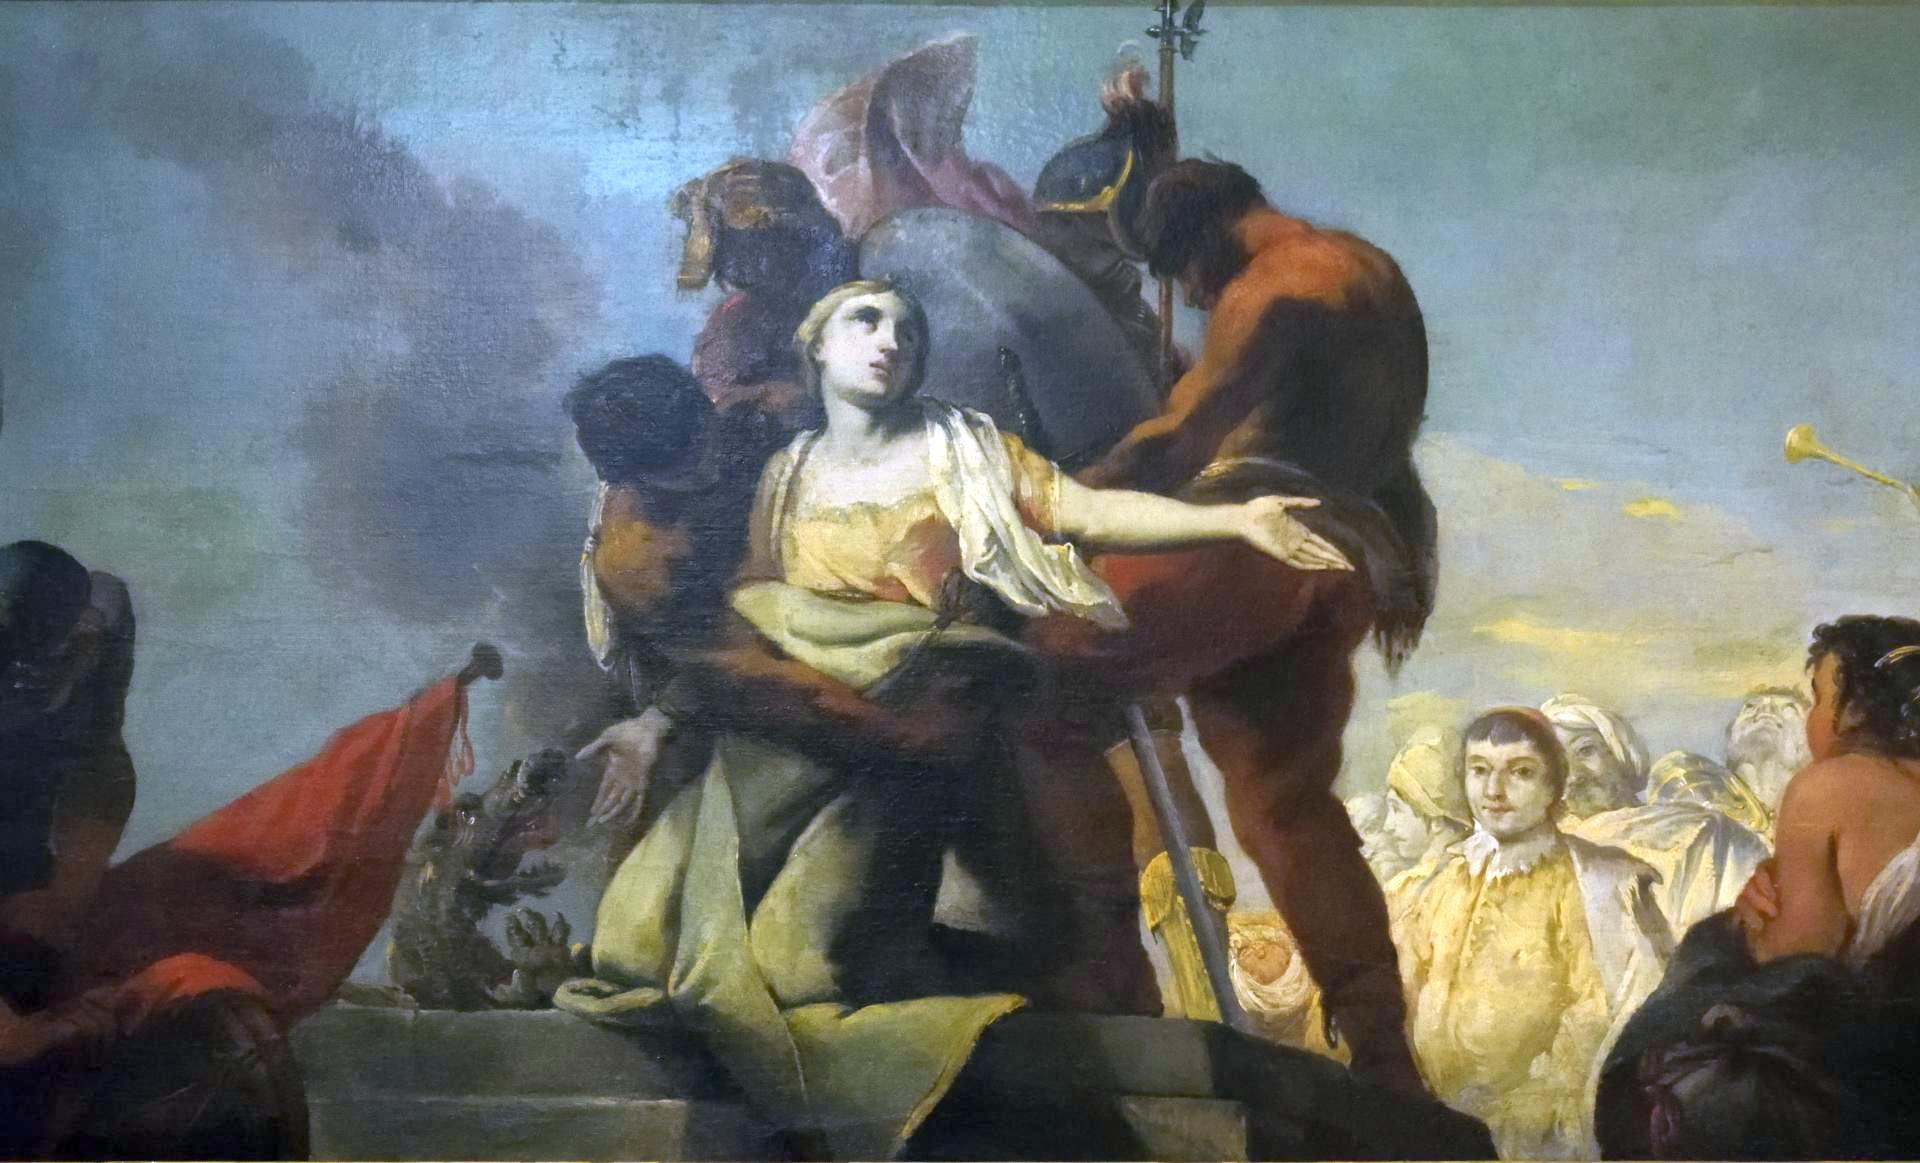 Oratorio di Santa Margherita - Padova - Presbiterio - Gloria di Santa Margherita - Pala